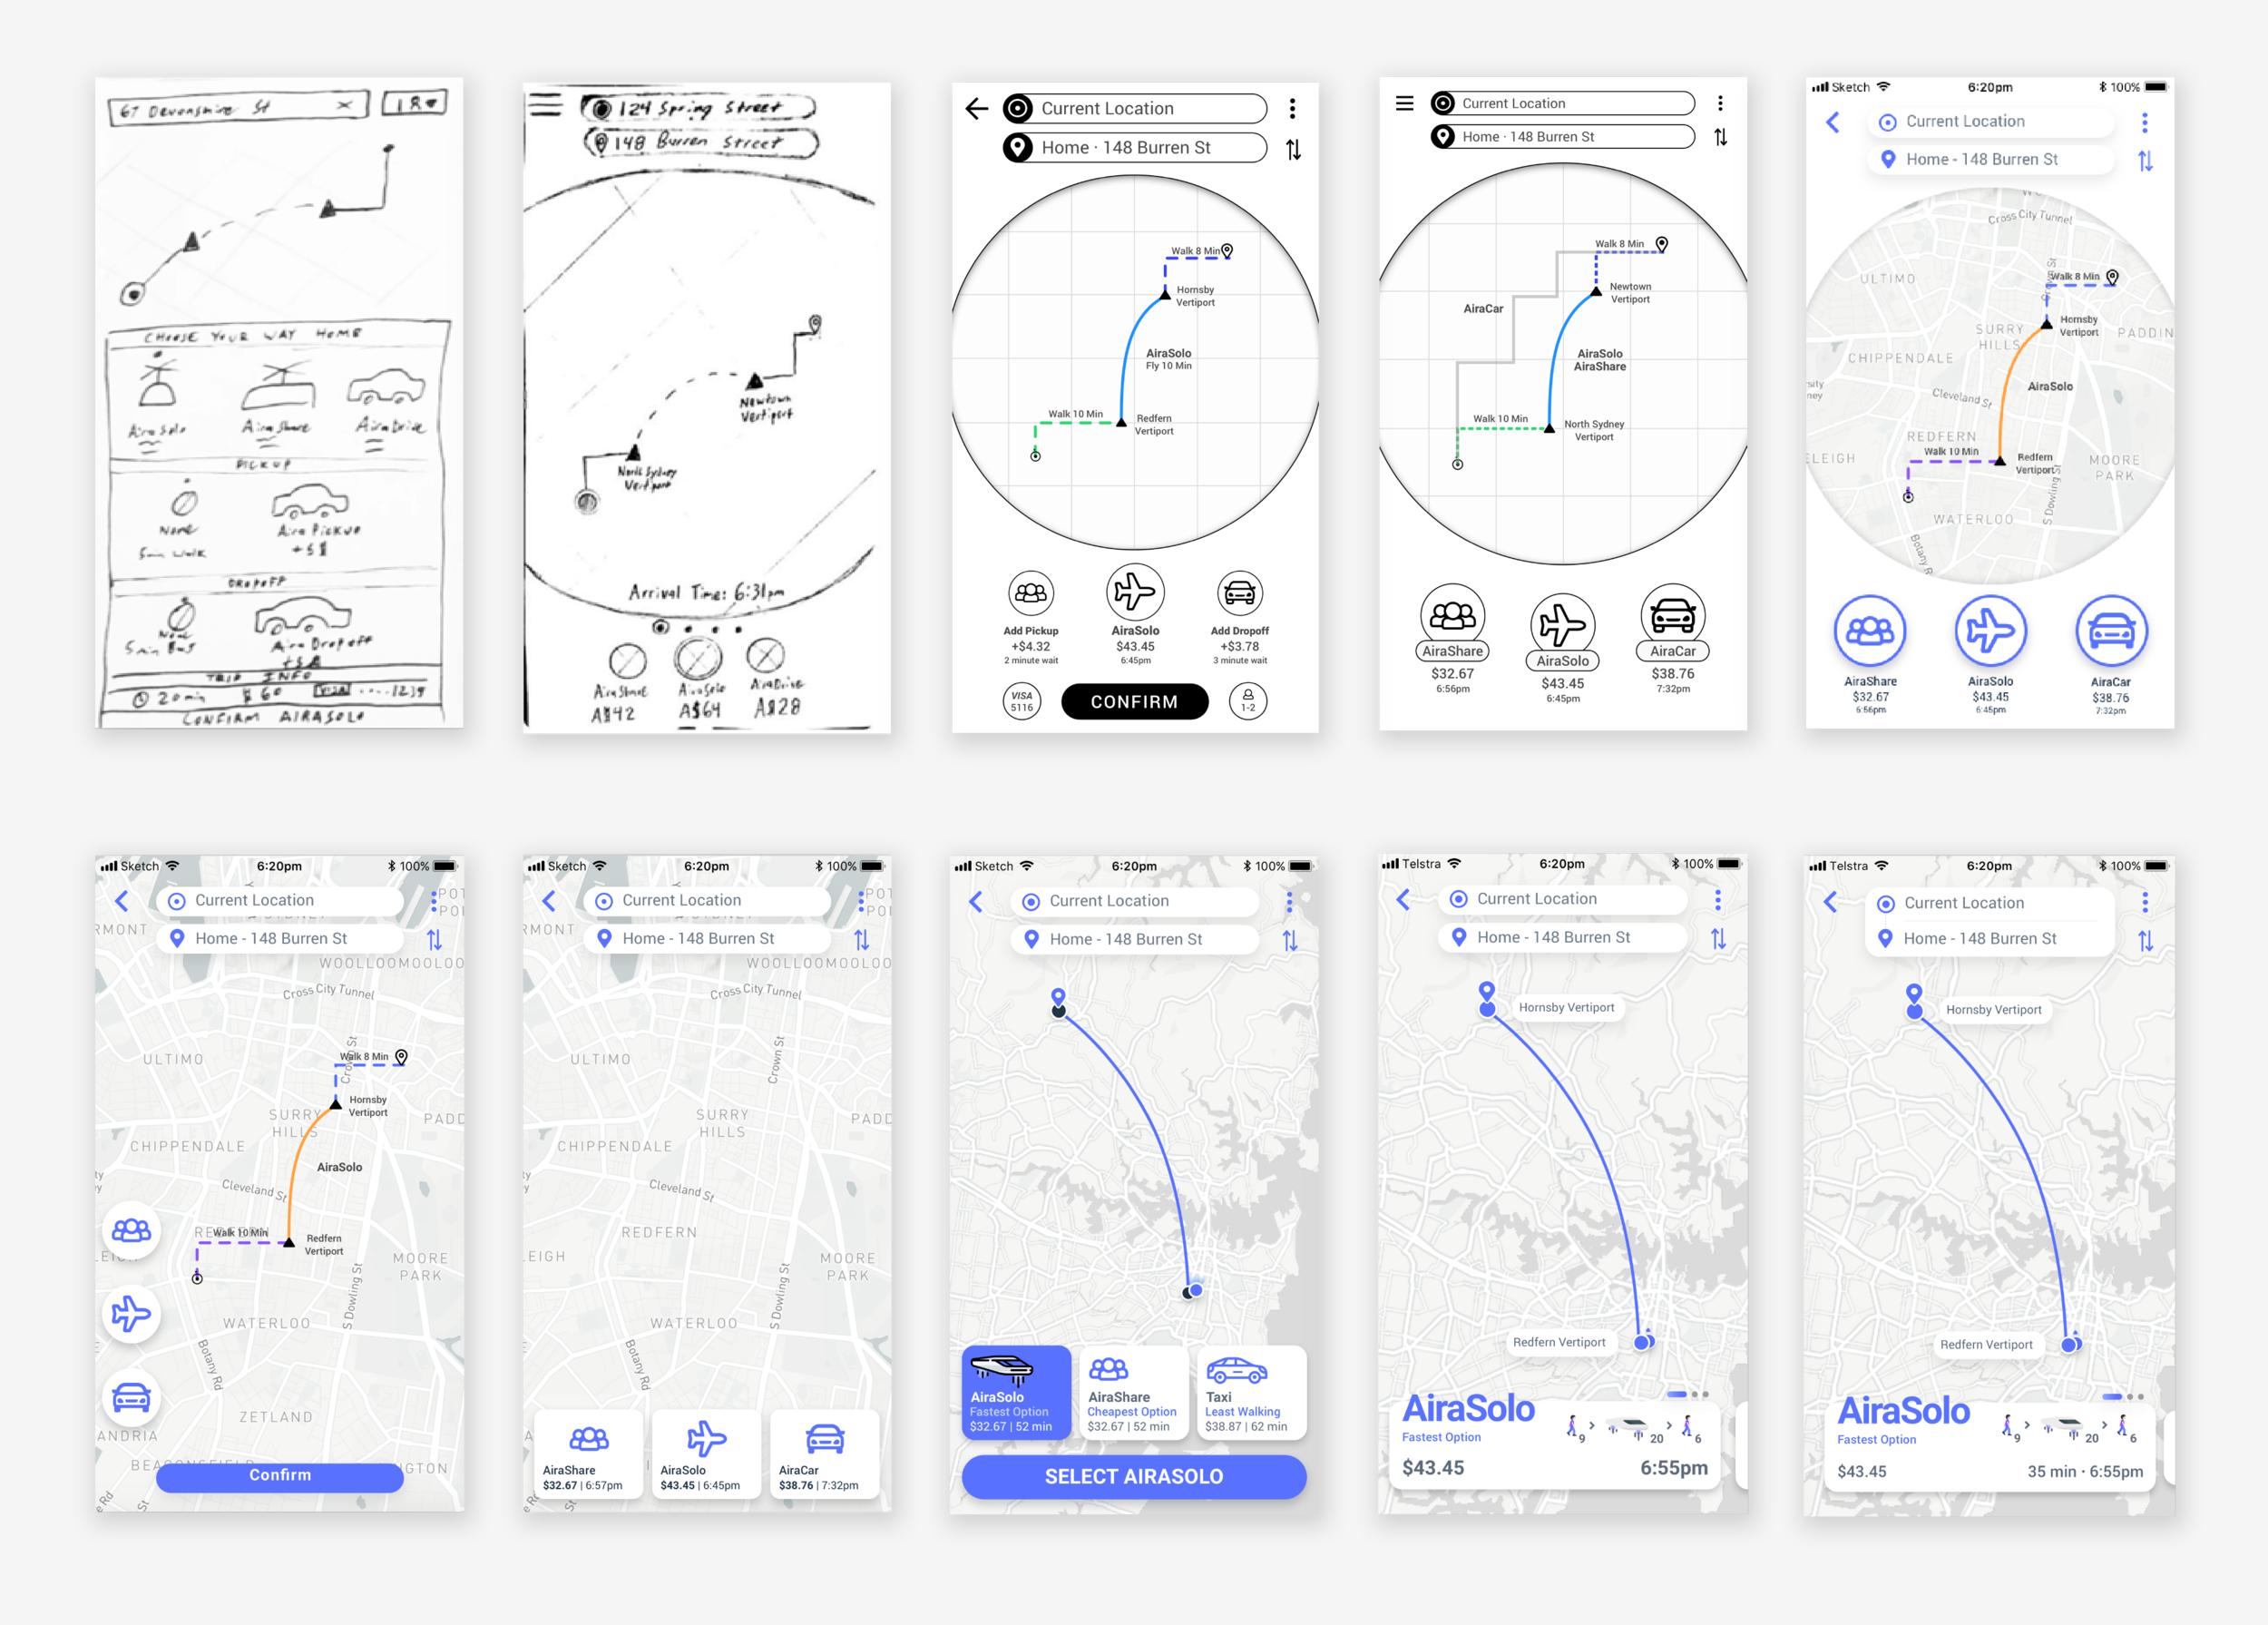 Aira - Imagining the future of multi-modal air transit